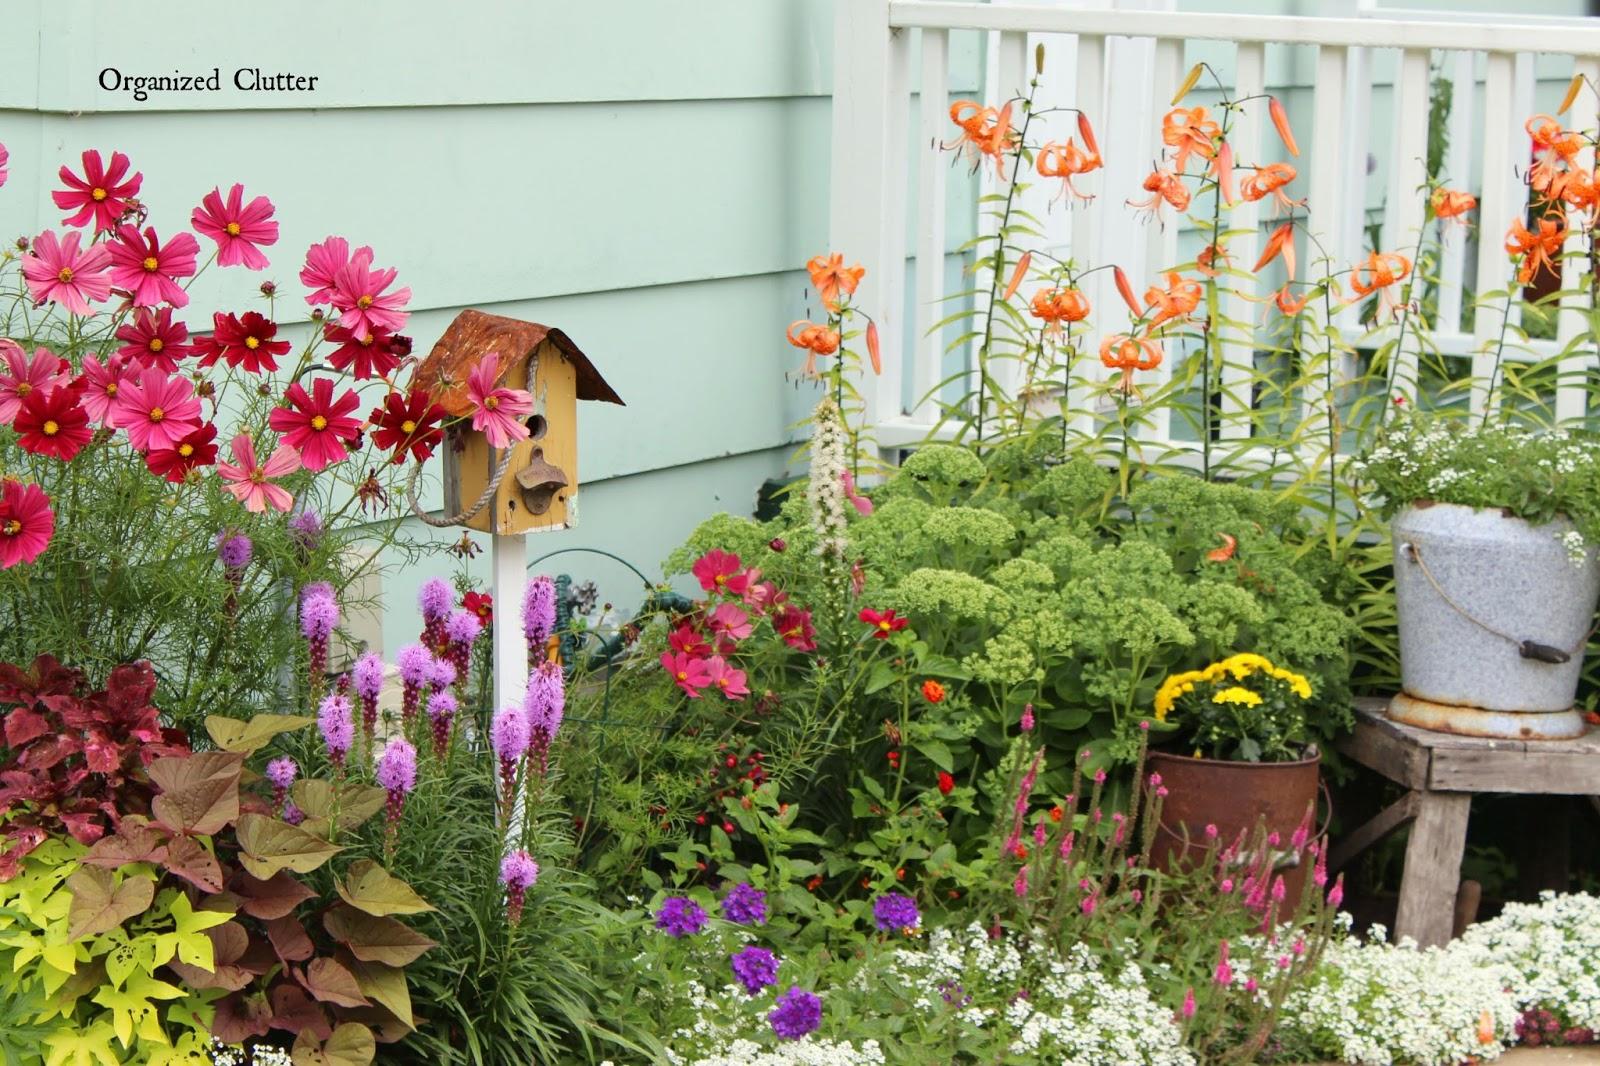 My Friend Danita\'s Rustic Garden Decor | Organized Clutter